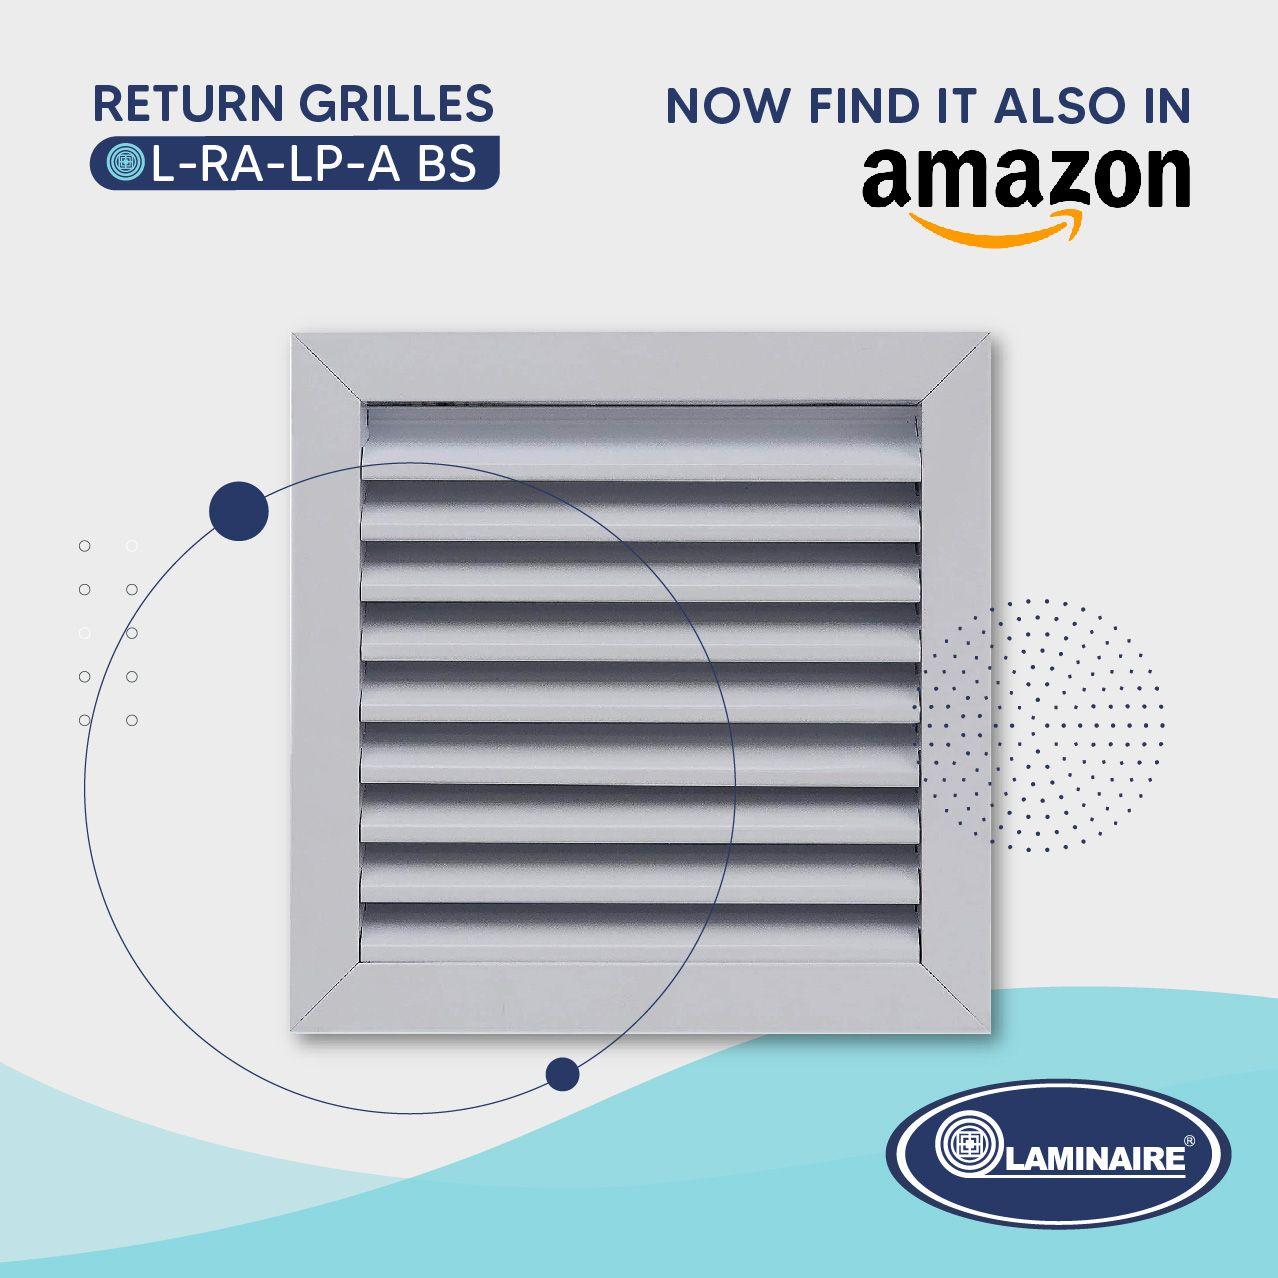 Return grilles